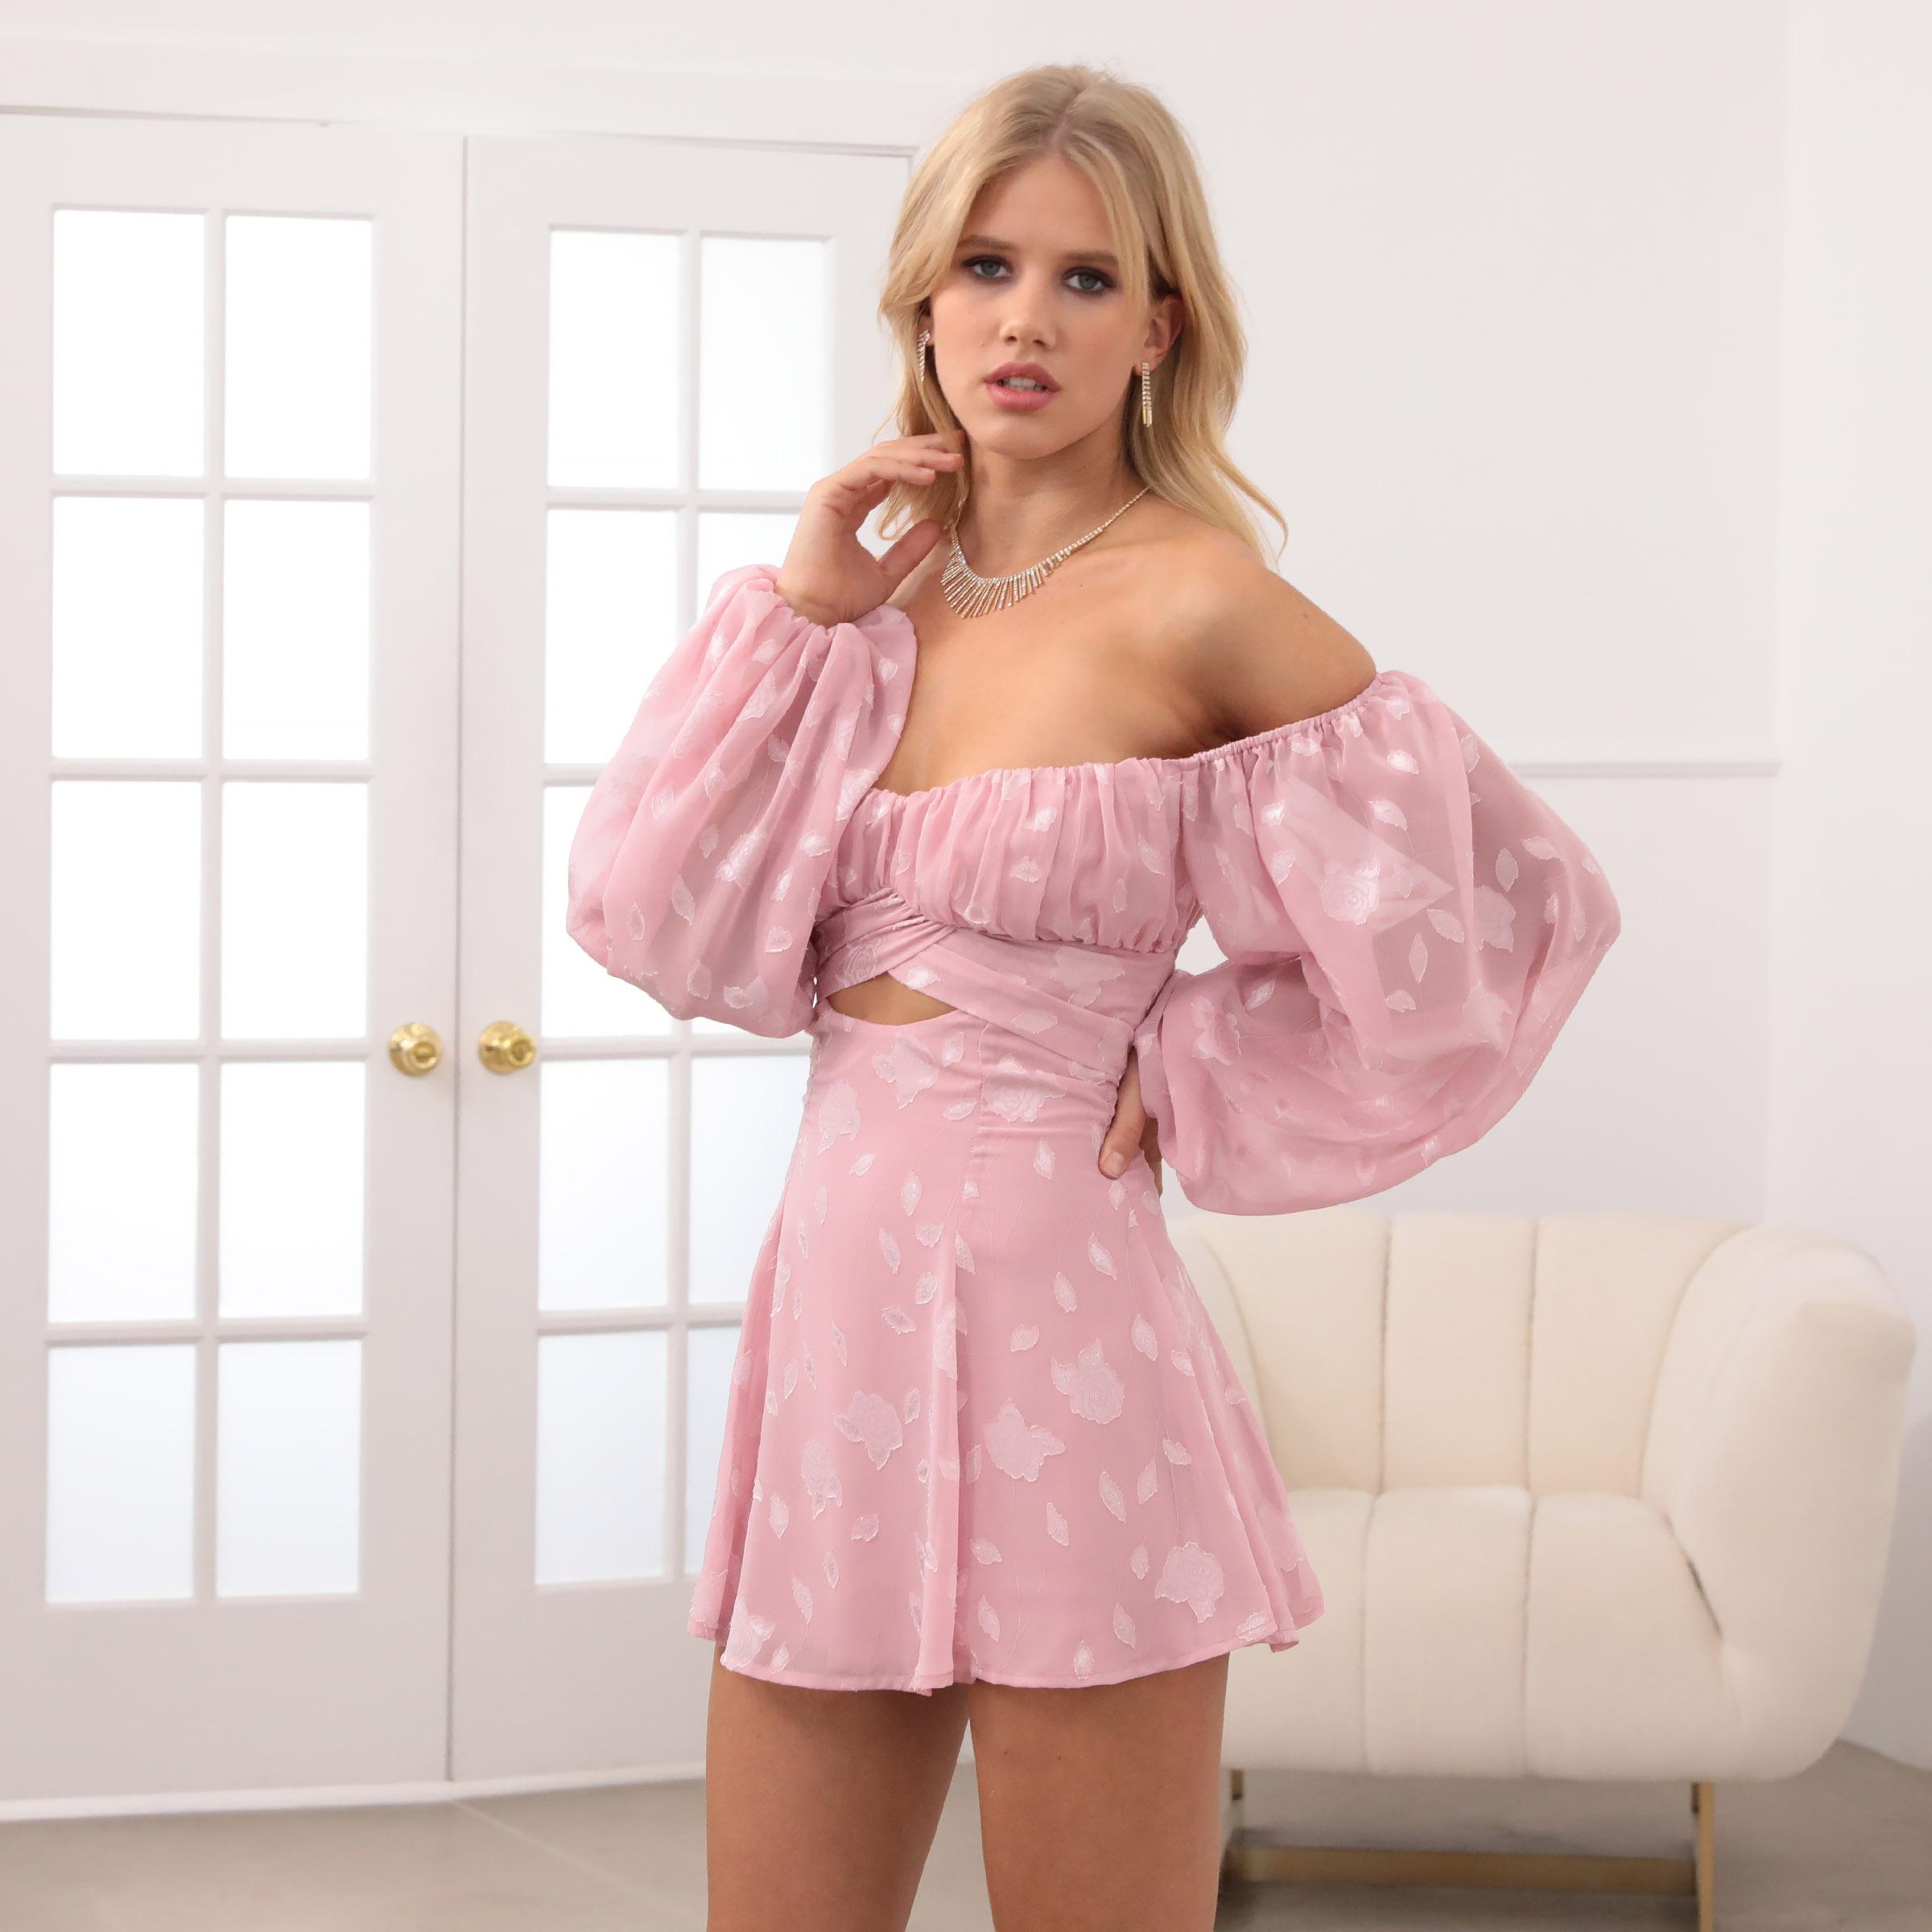 Sadie Off The Shoulder Dress in Pink Floral